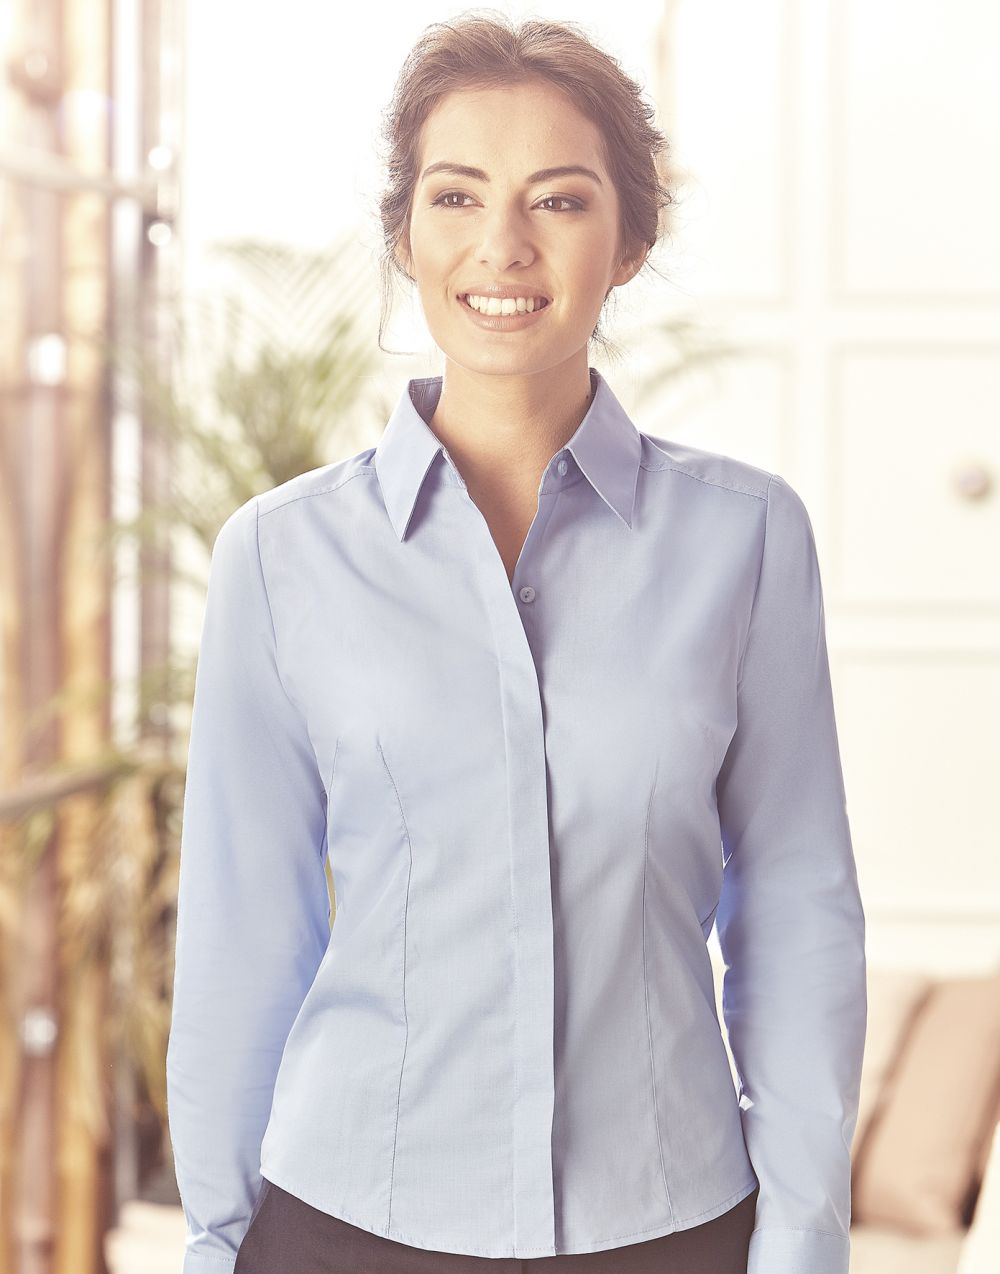 Camisas manga larga russell popelina manga larga mujer con impresión imagen 6